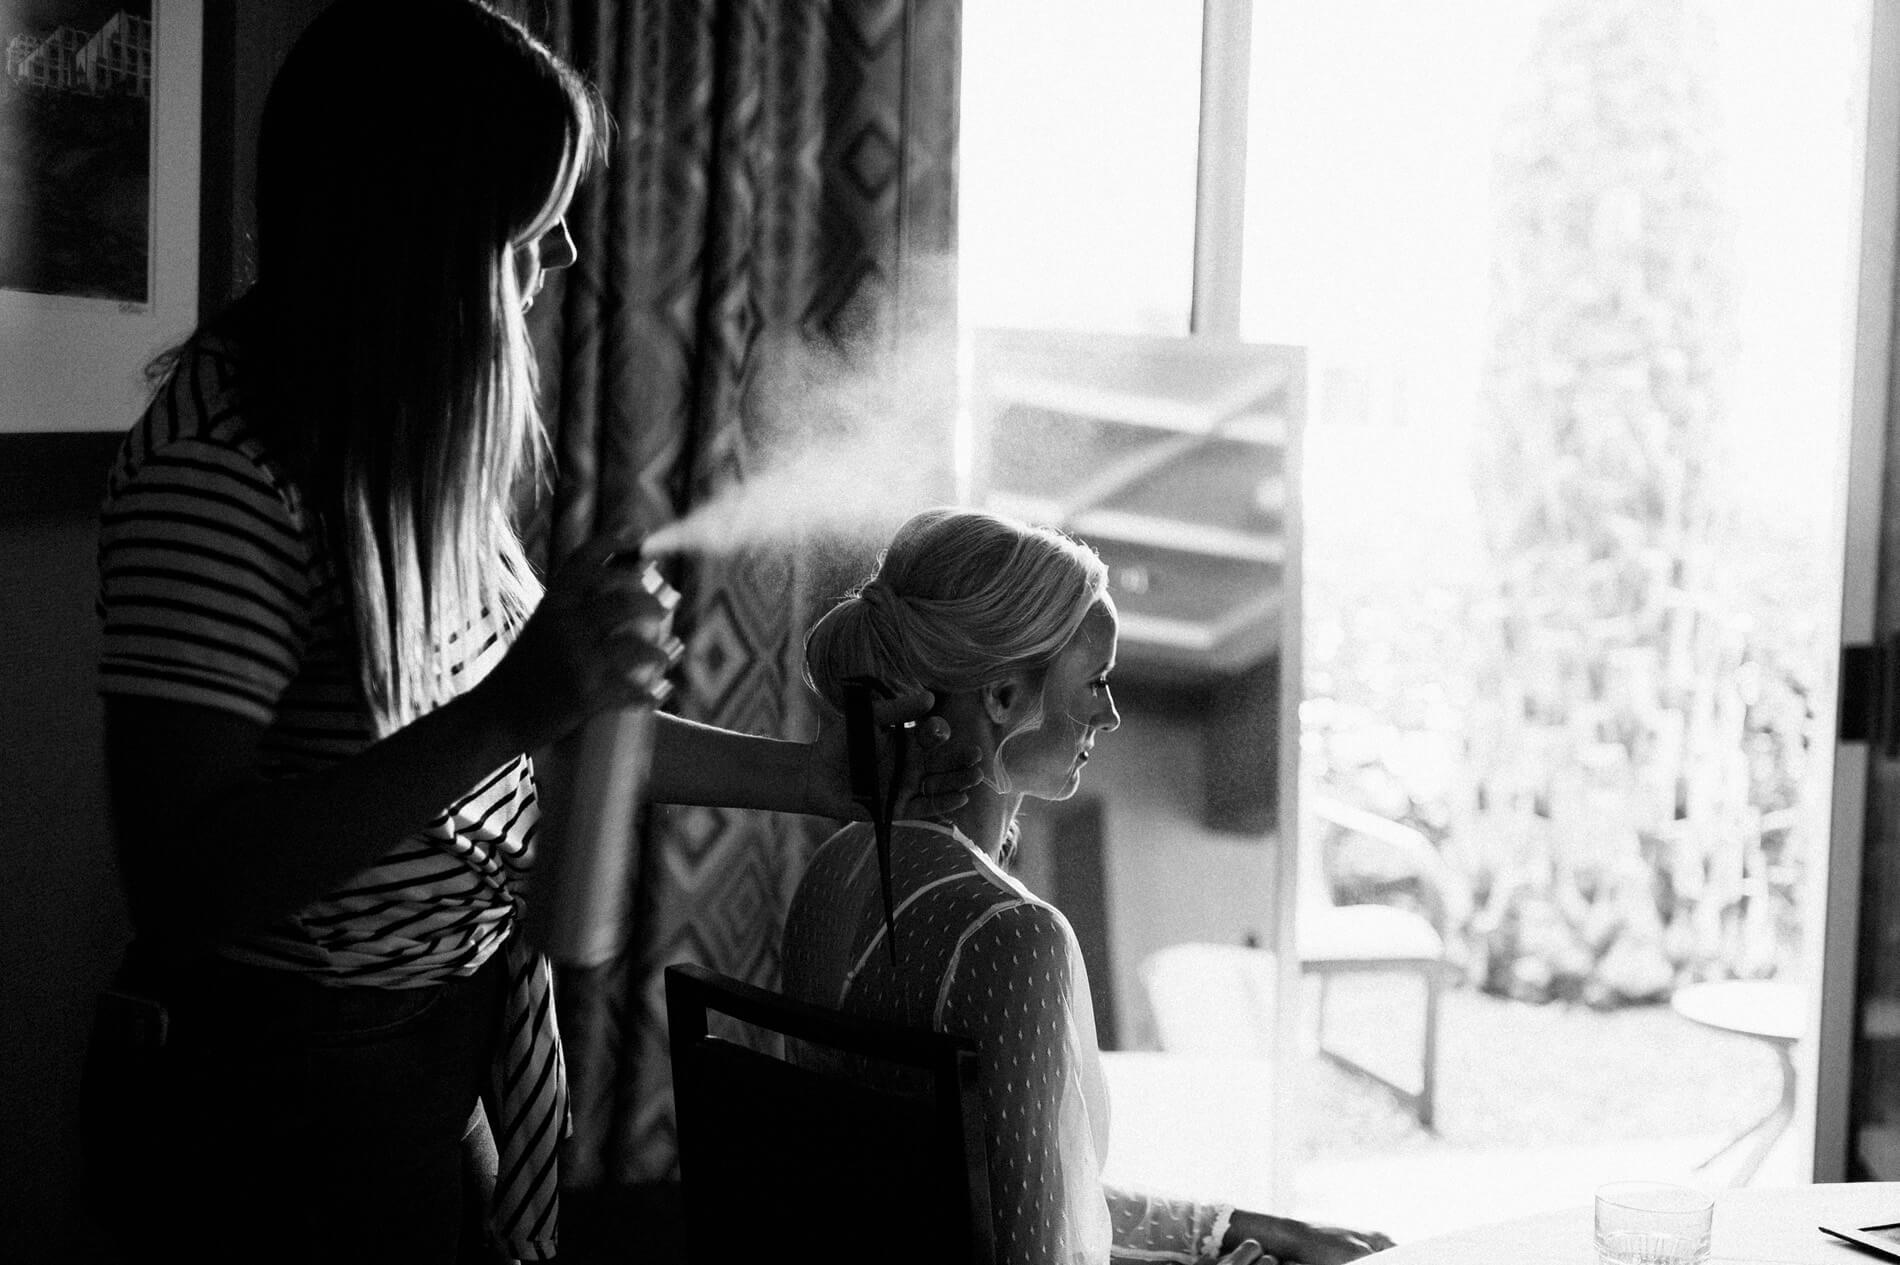 stylist spraying hairspray on bride